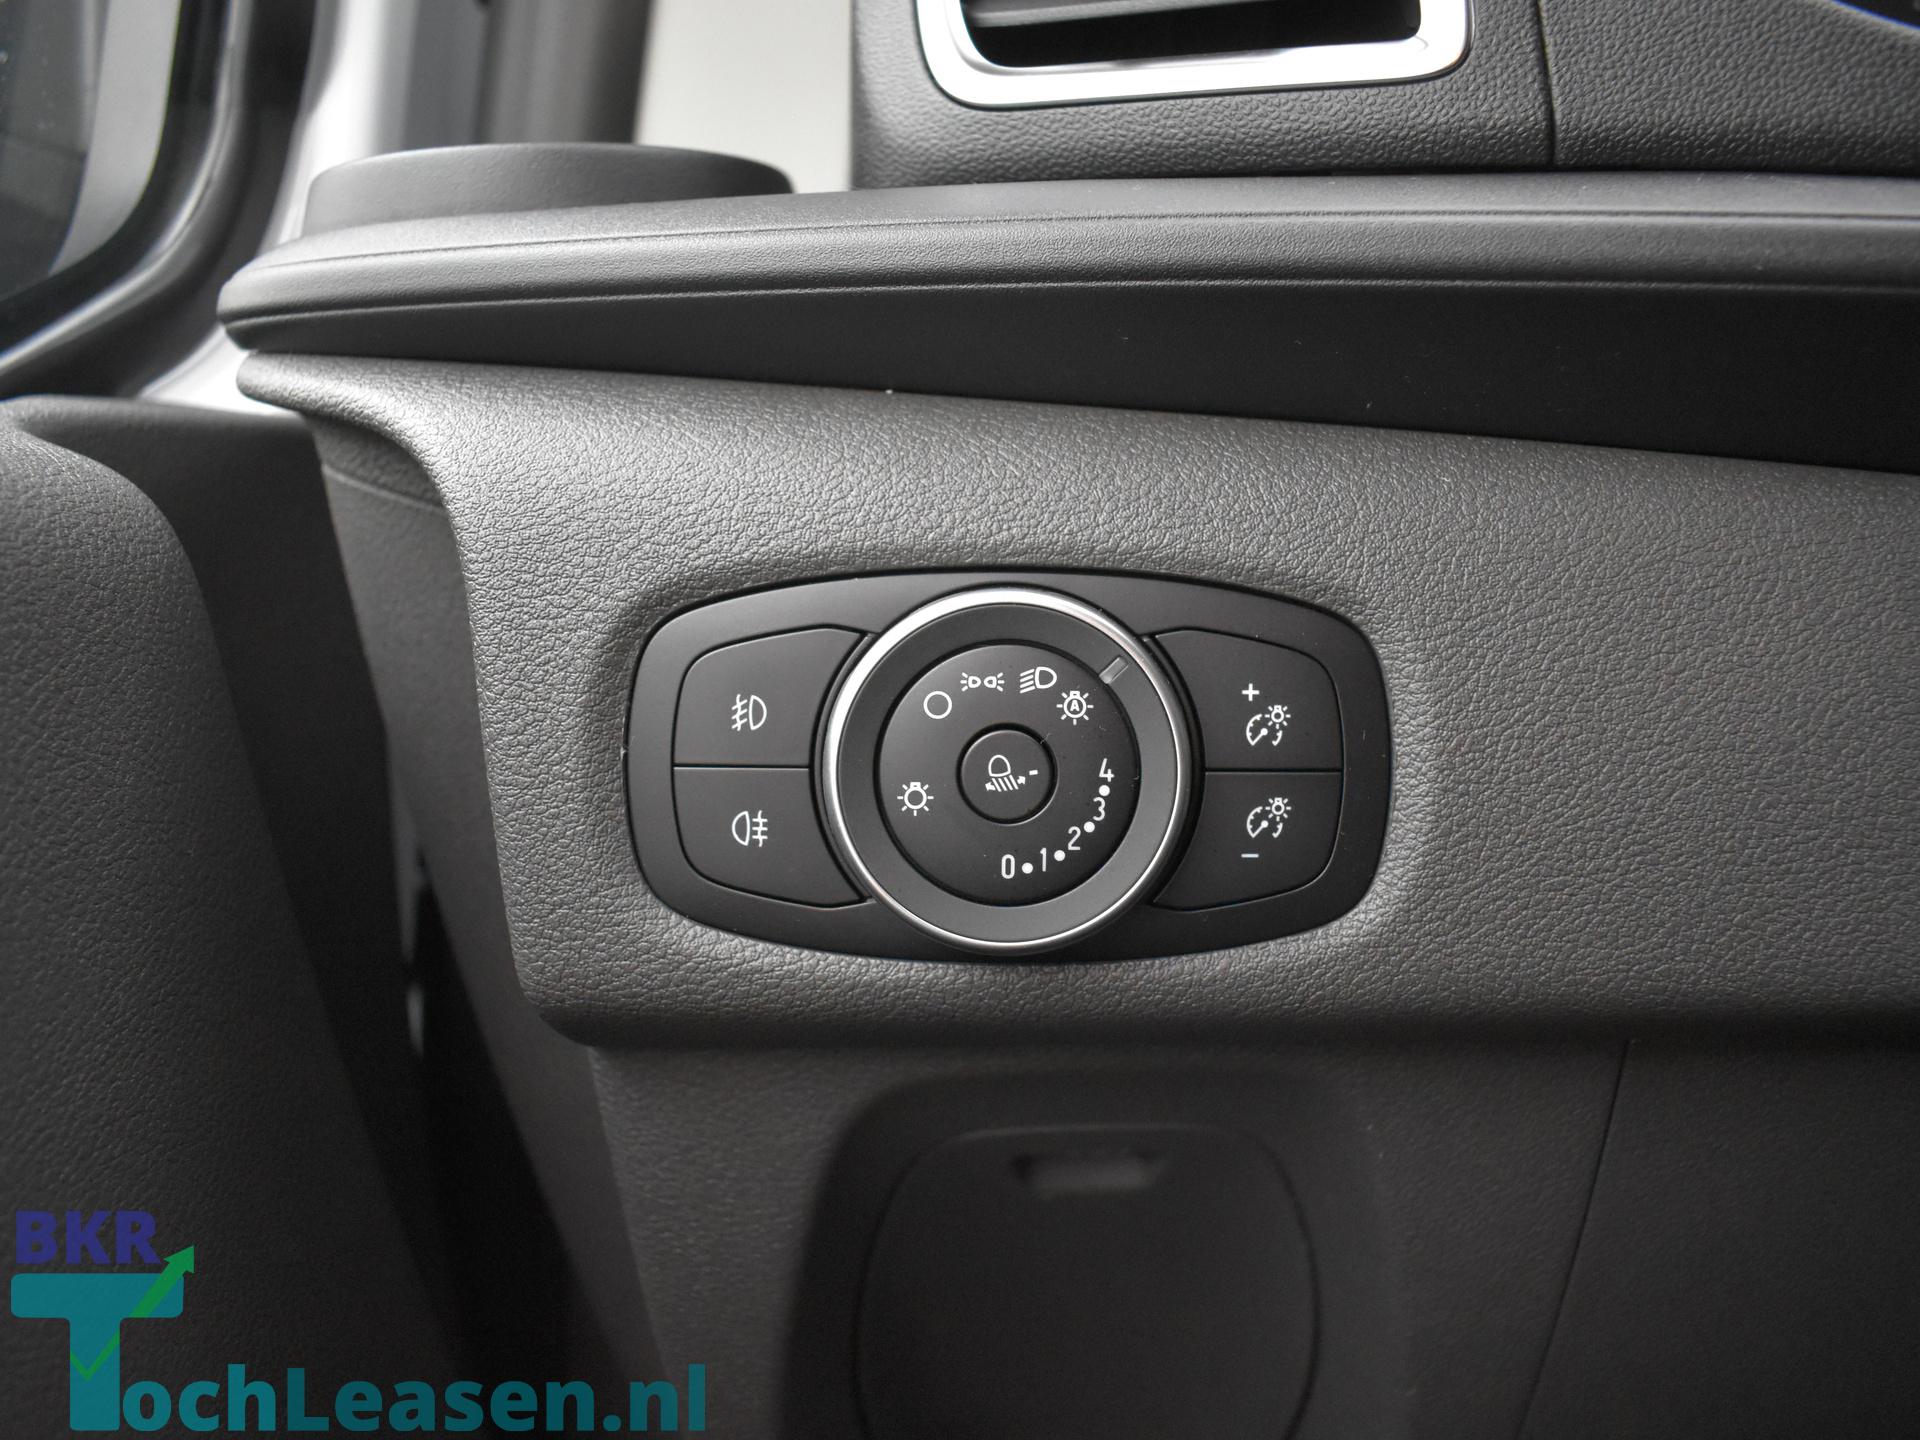 BKRtochleasen.nl - Ford Transit - Wit sport9